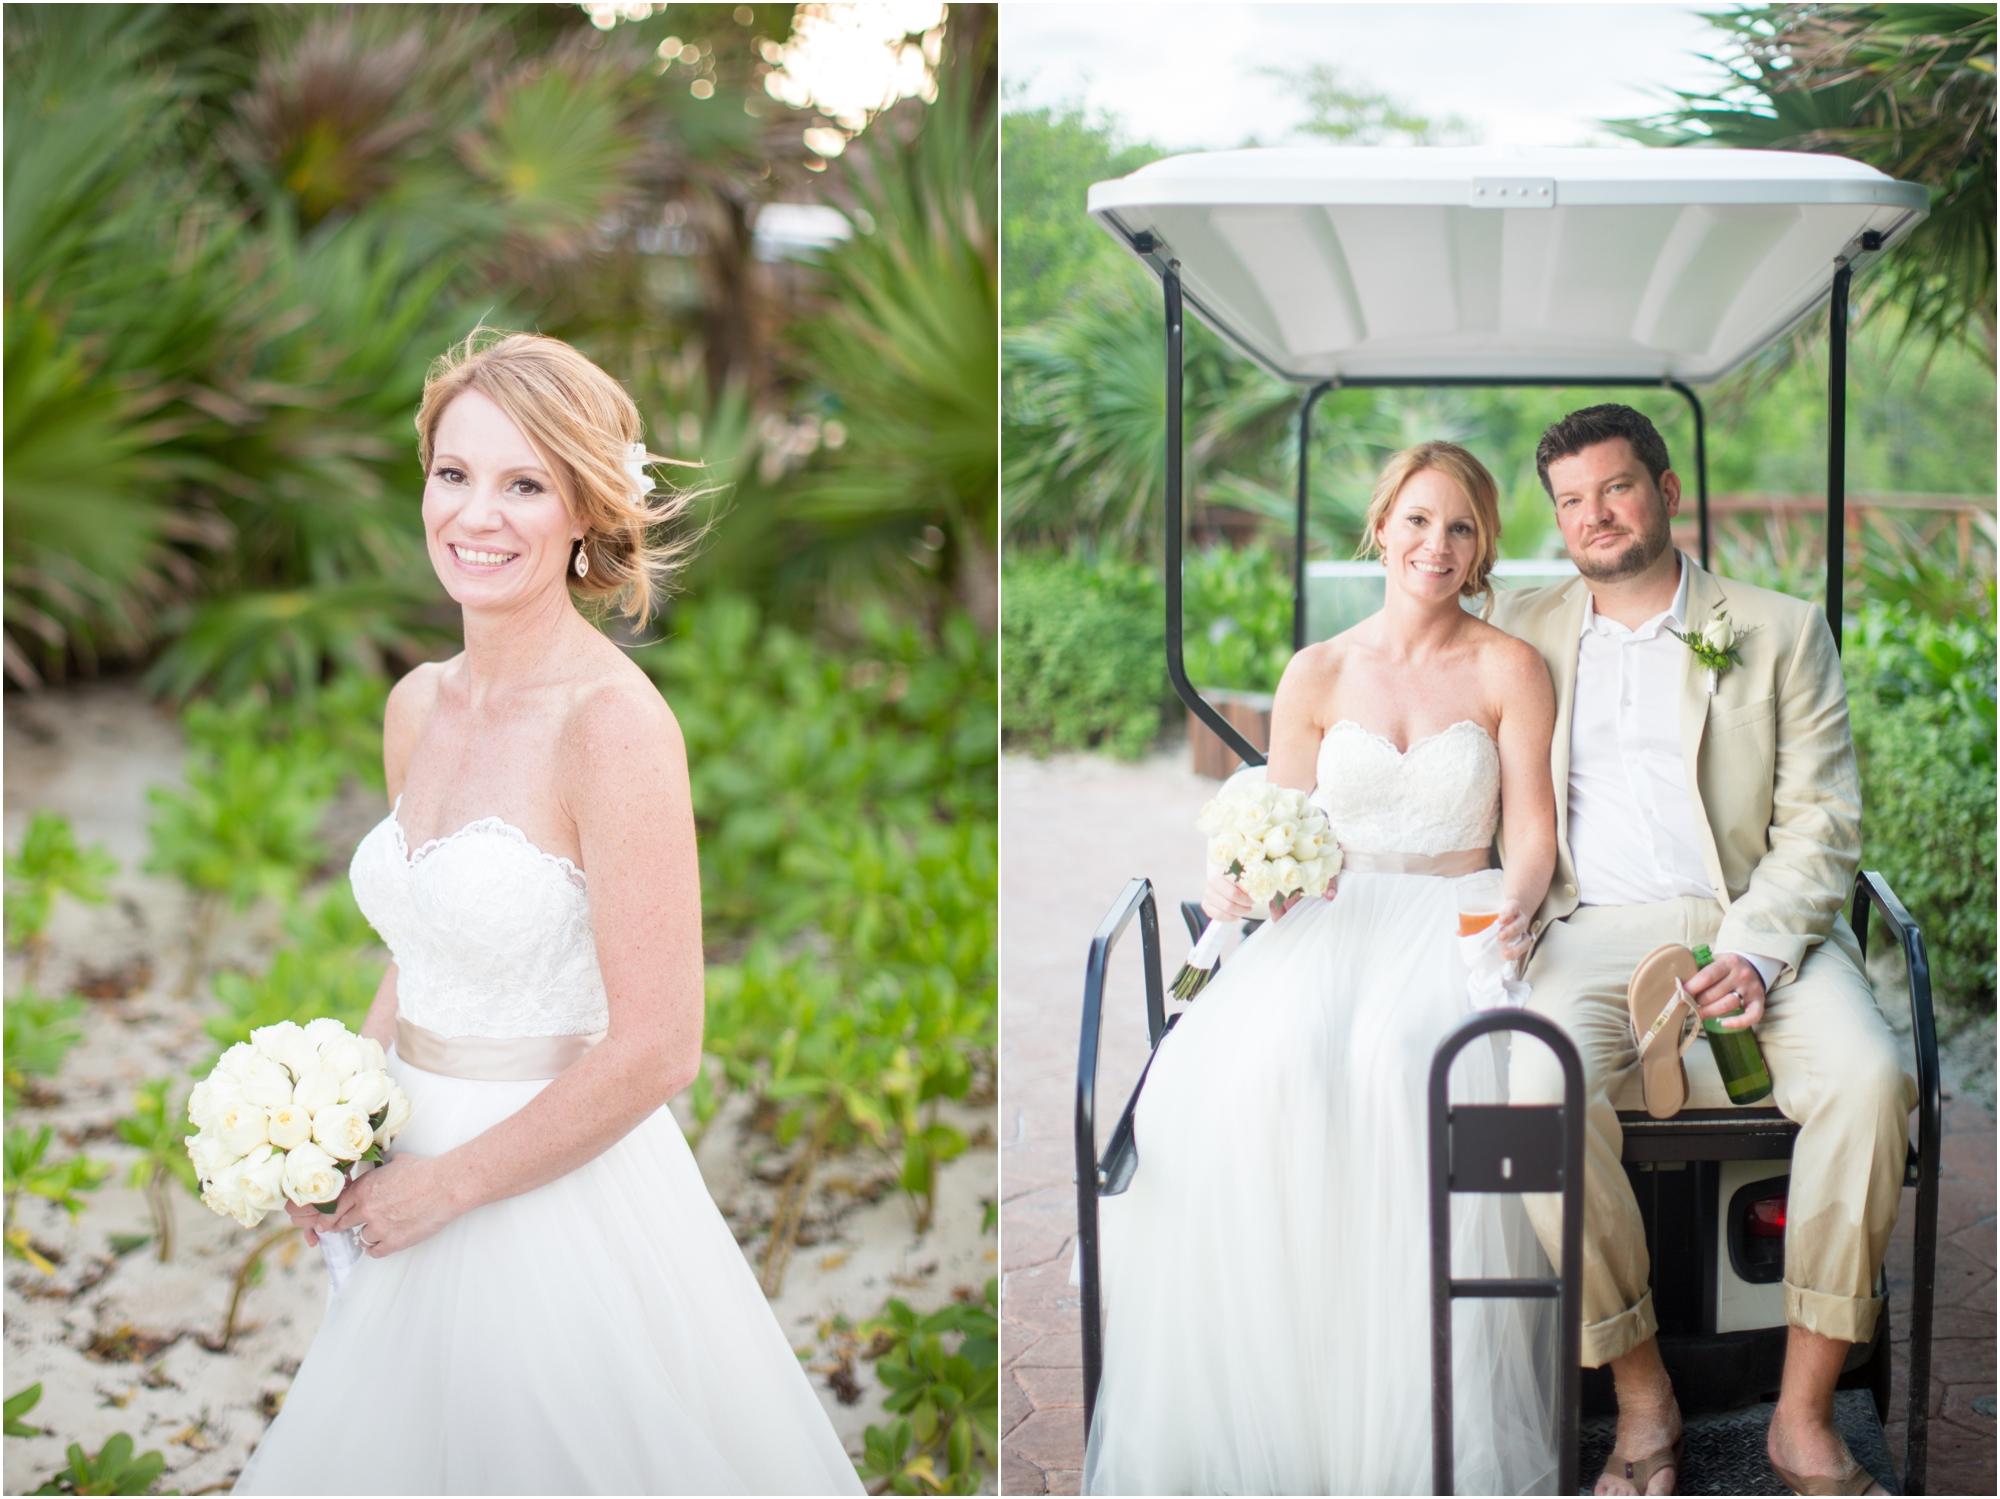 Morosoff Wedding 4-Bride & Groom Portraits-518_anna grace photography destination wedding photographer playa del carmen mexico photo.jpg